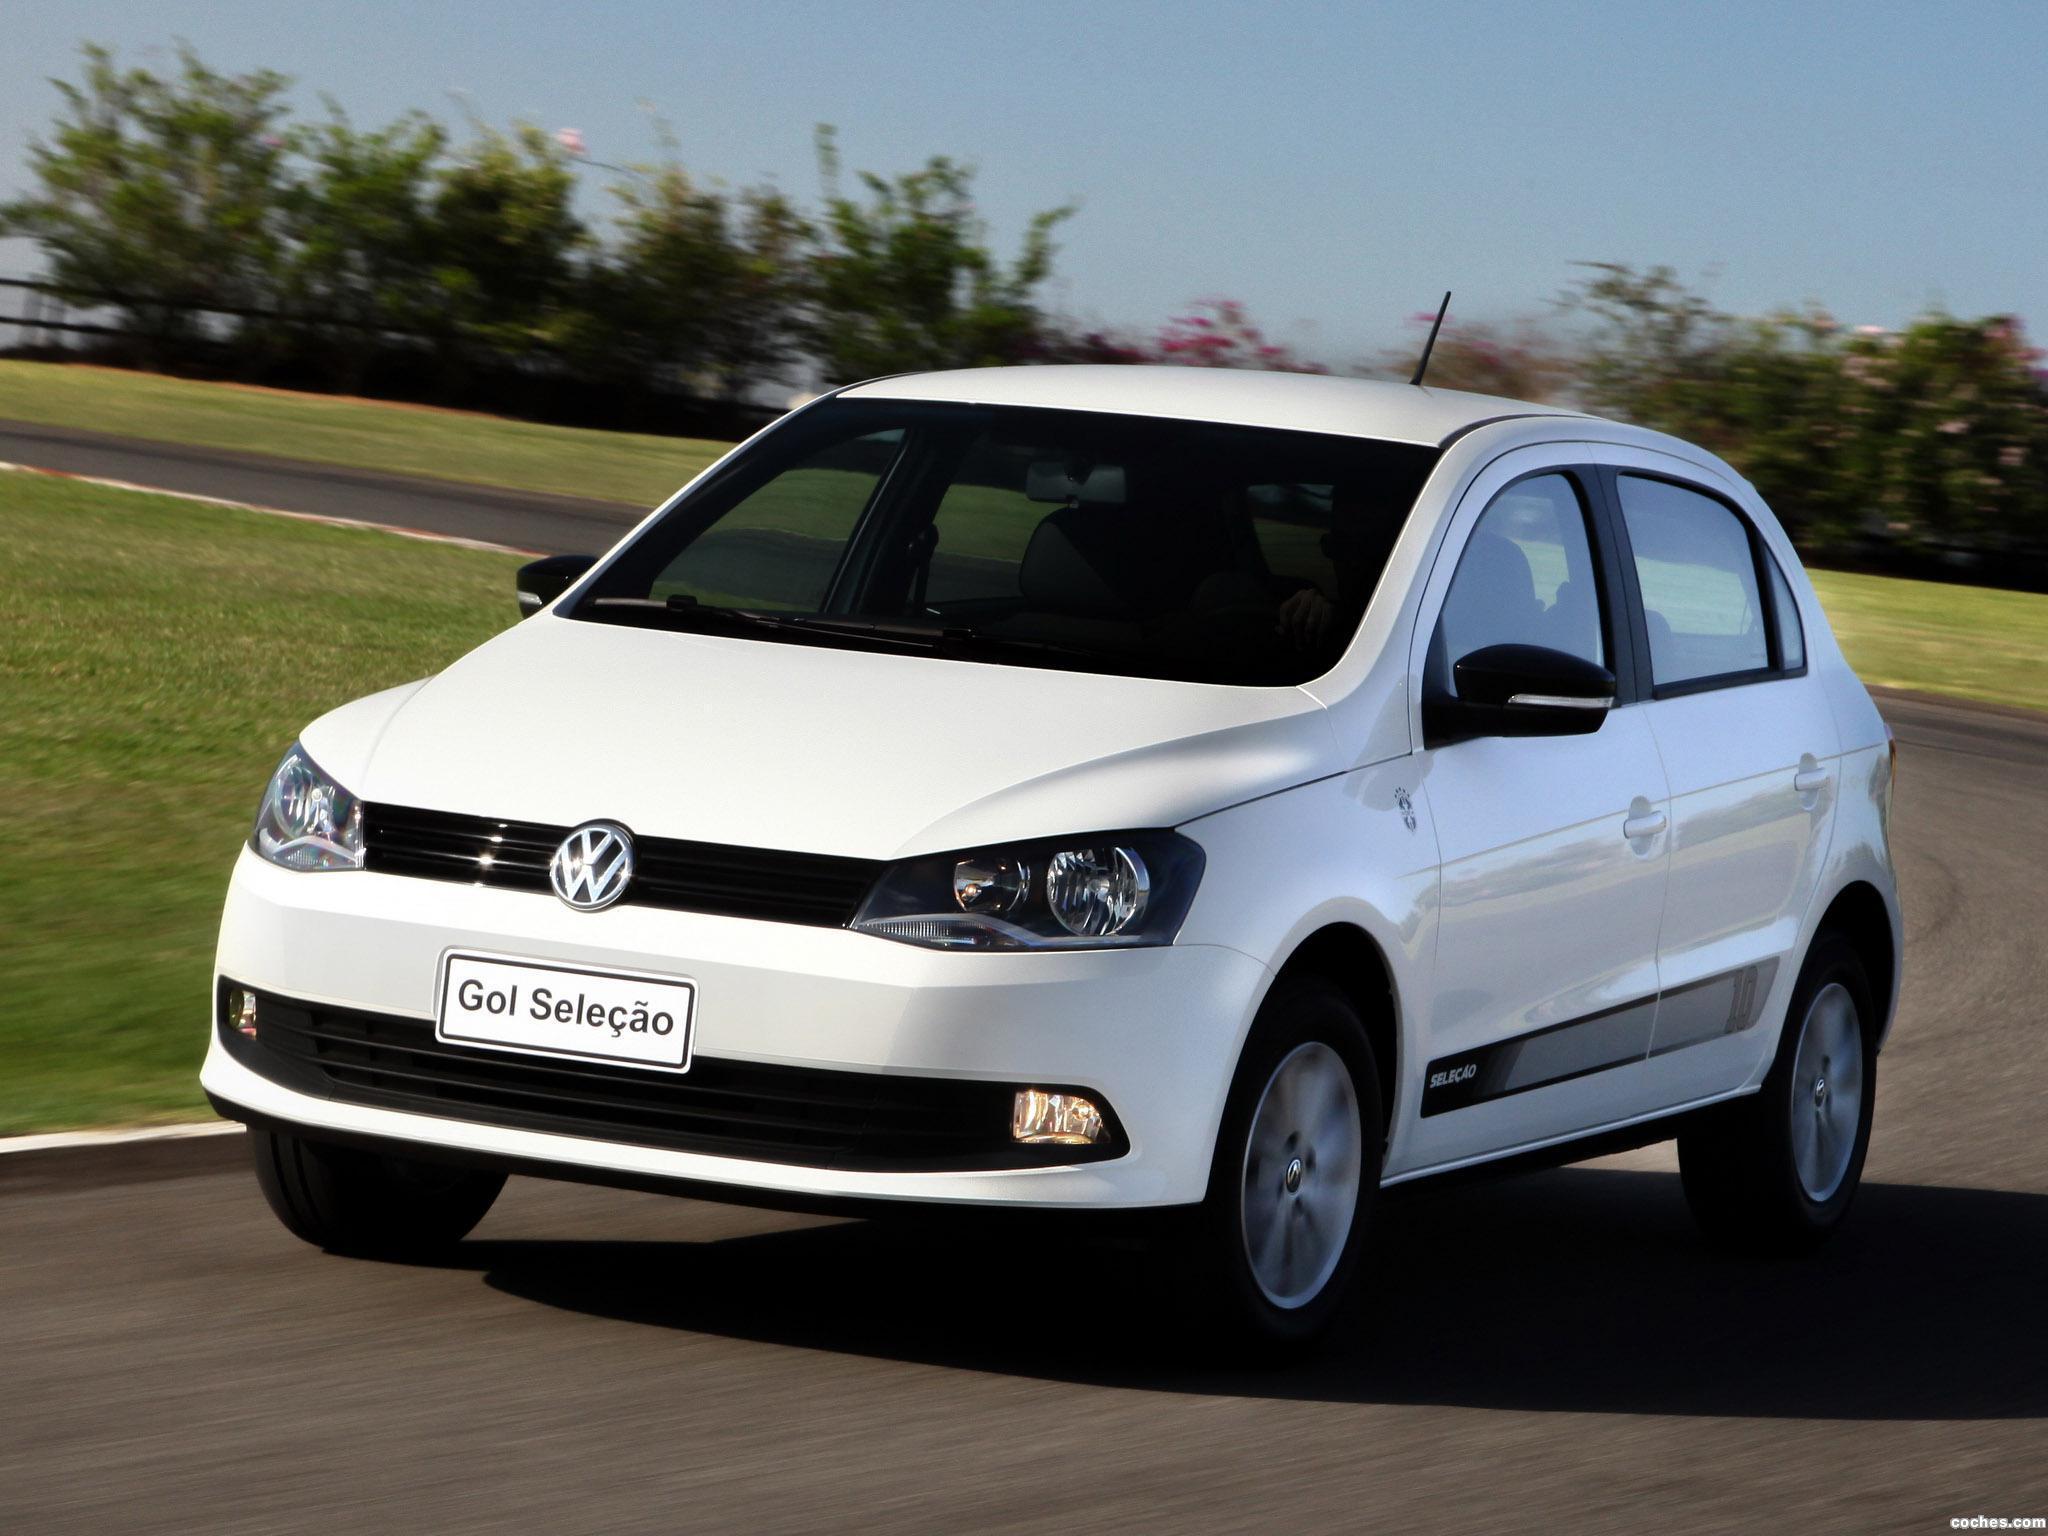 Foto 0 de Volkswagen Gol Selecao 2013